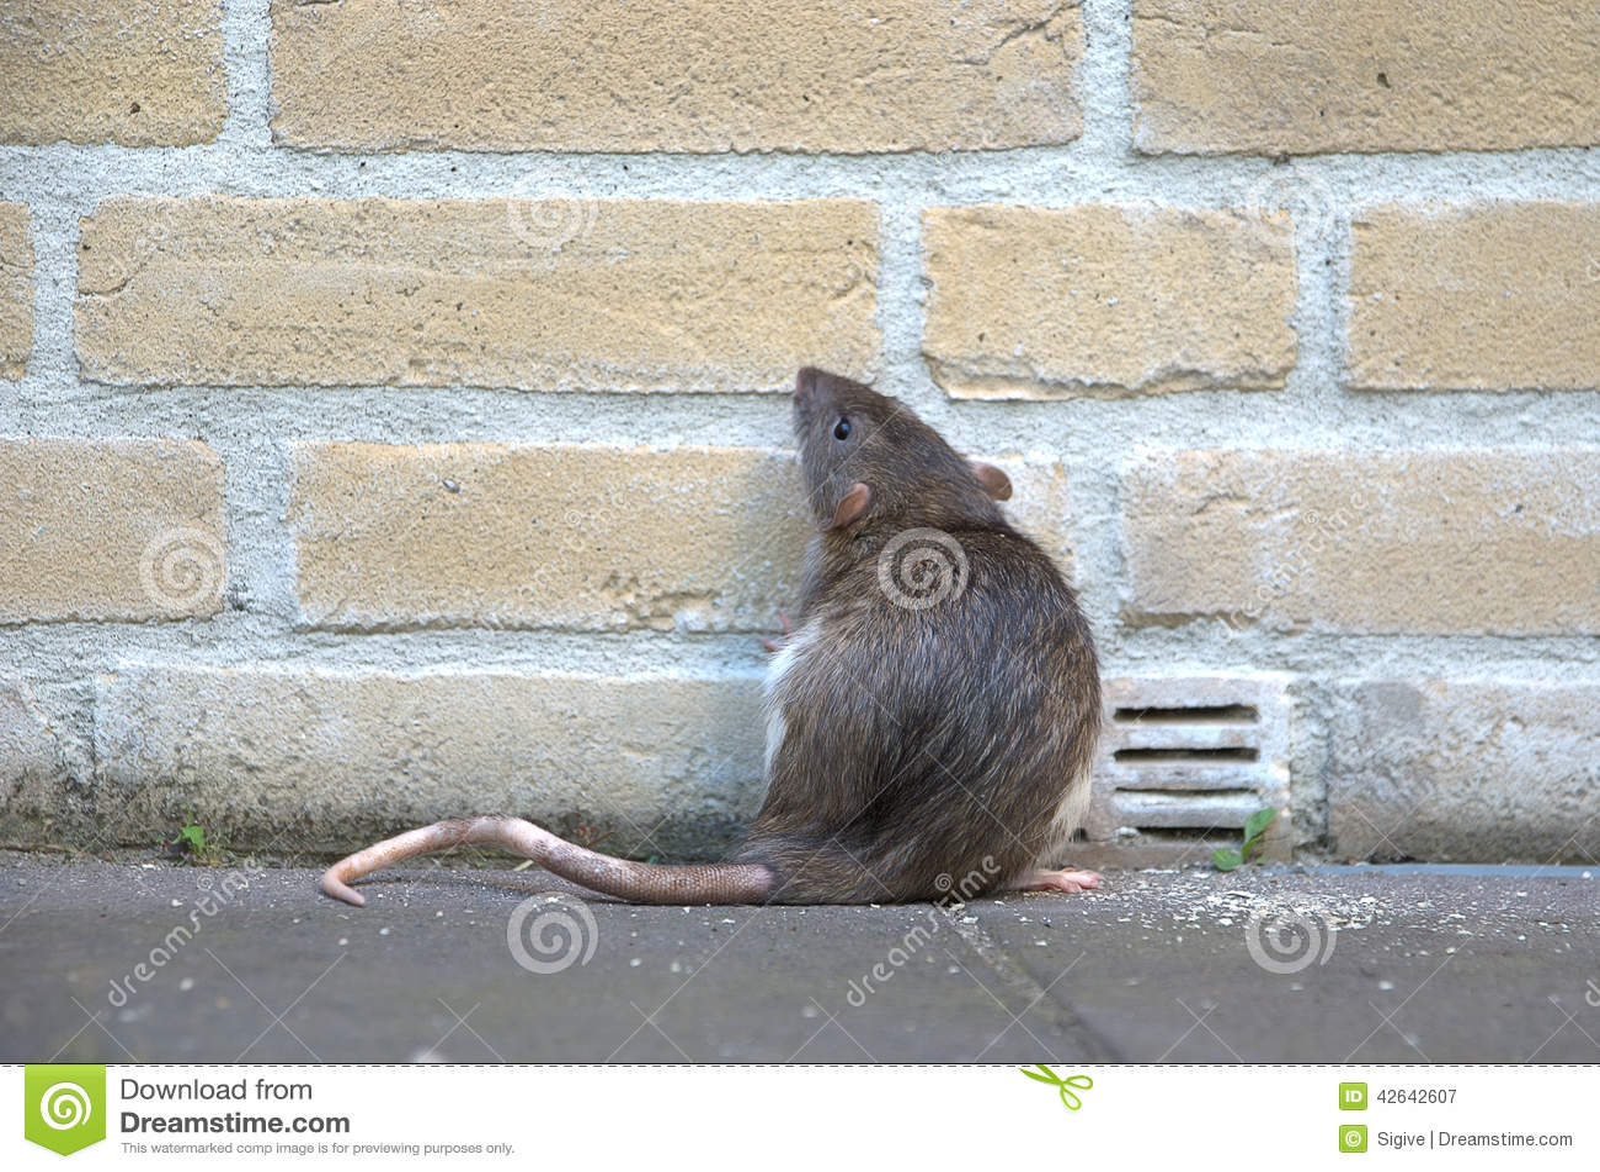 Urban Rat Stock Photo Image 42642607